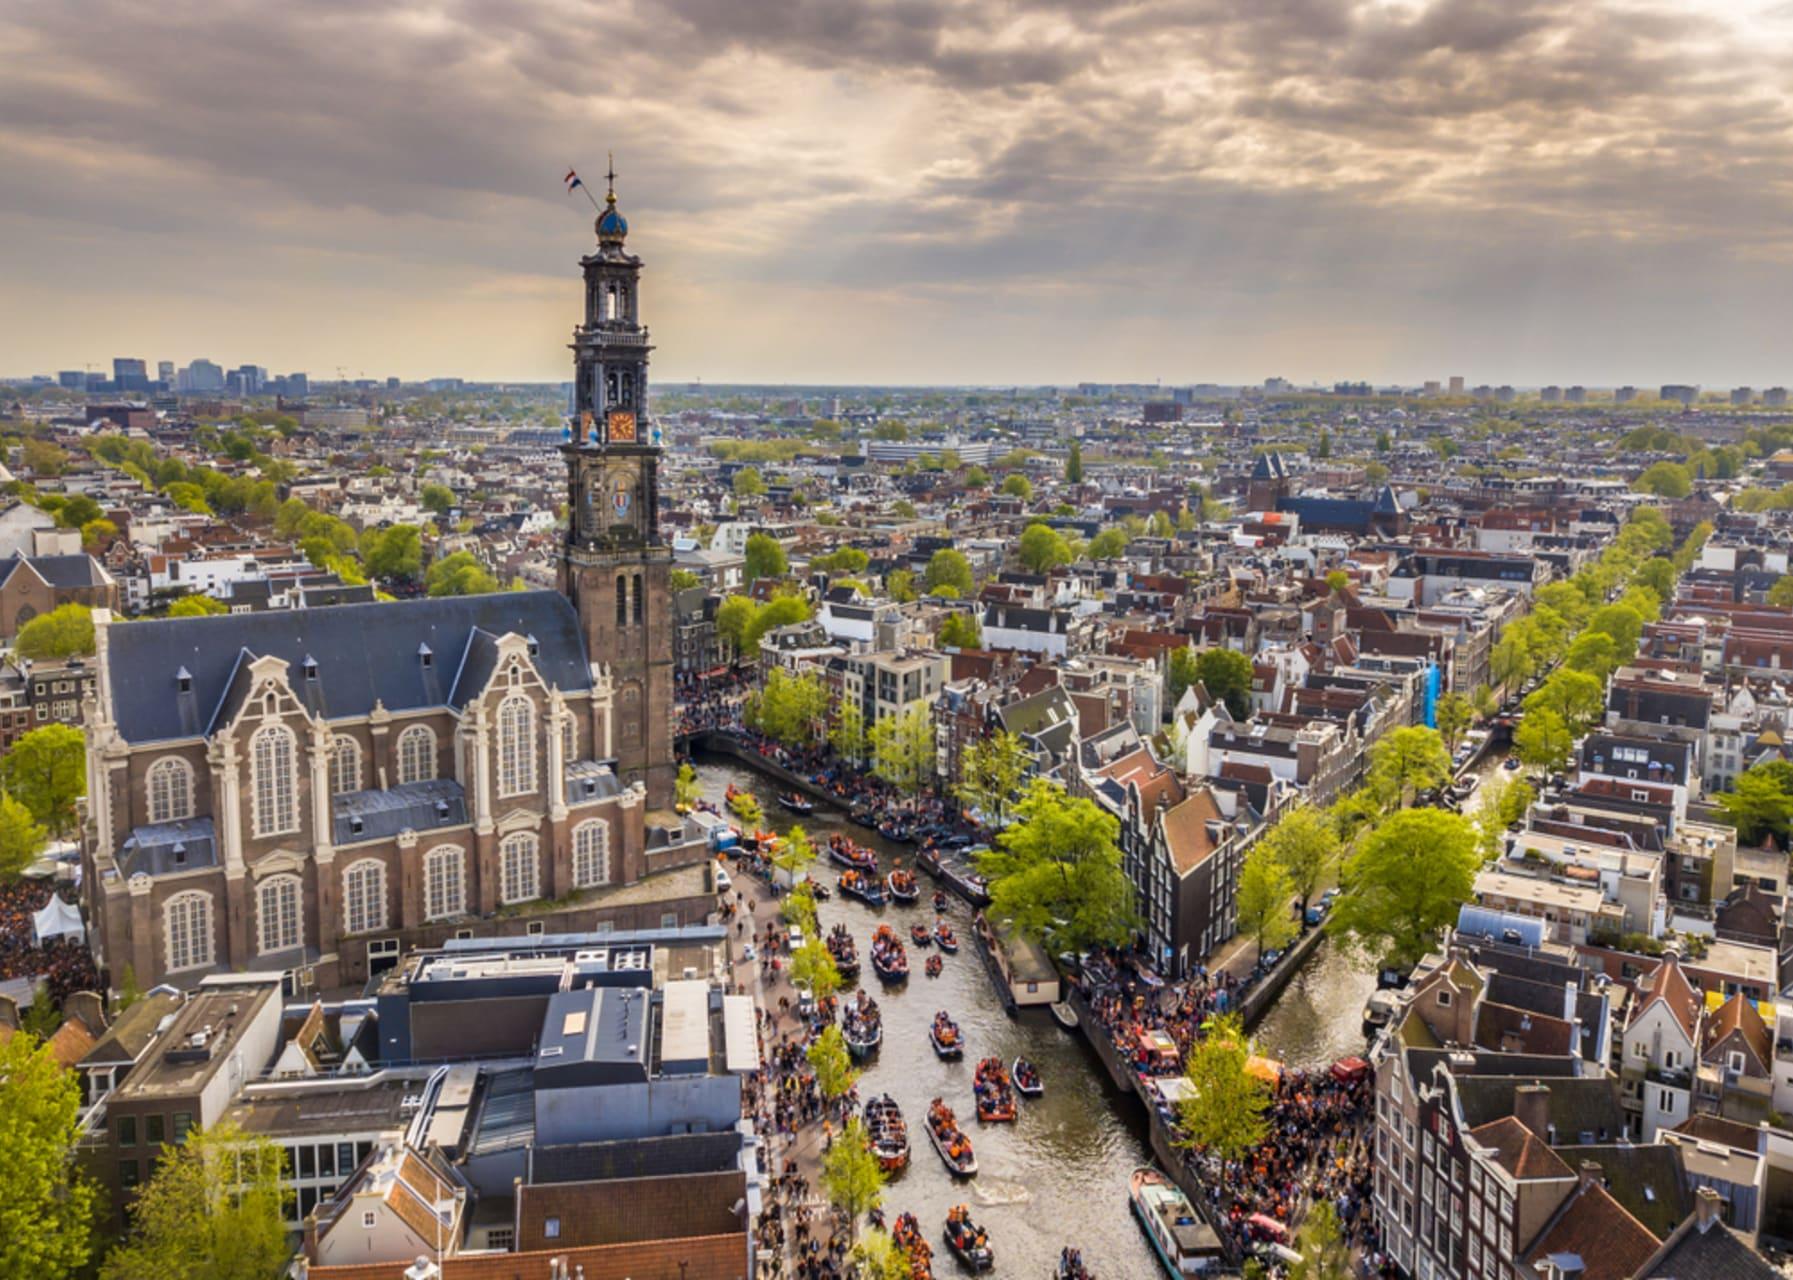 Amsterdam - Anne Frank and the secret annex